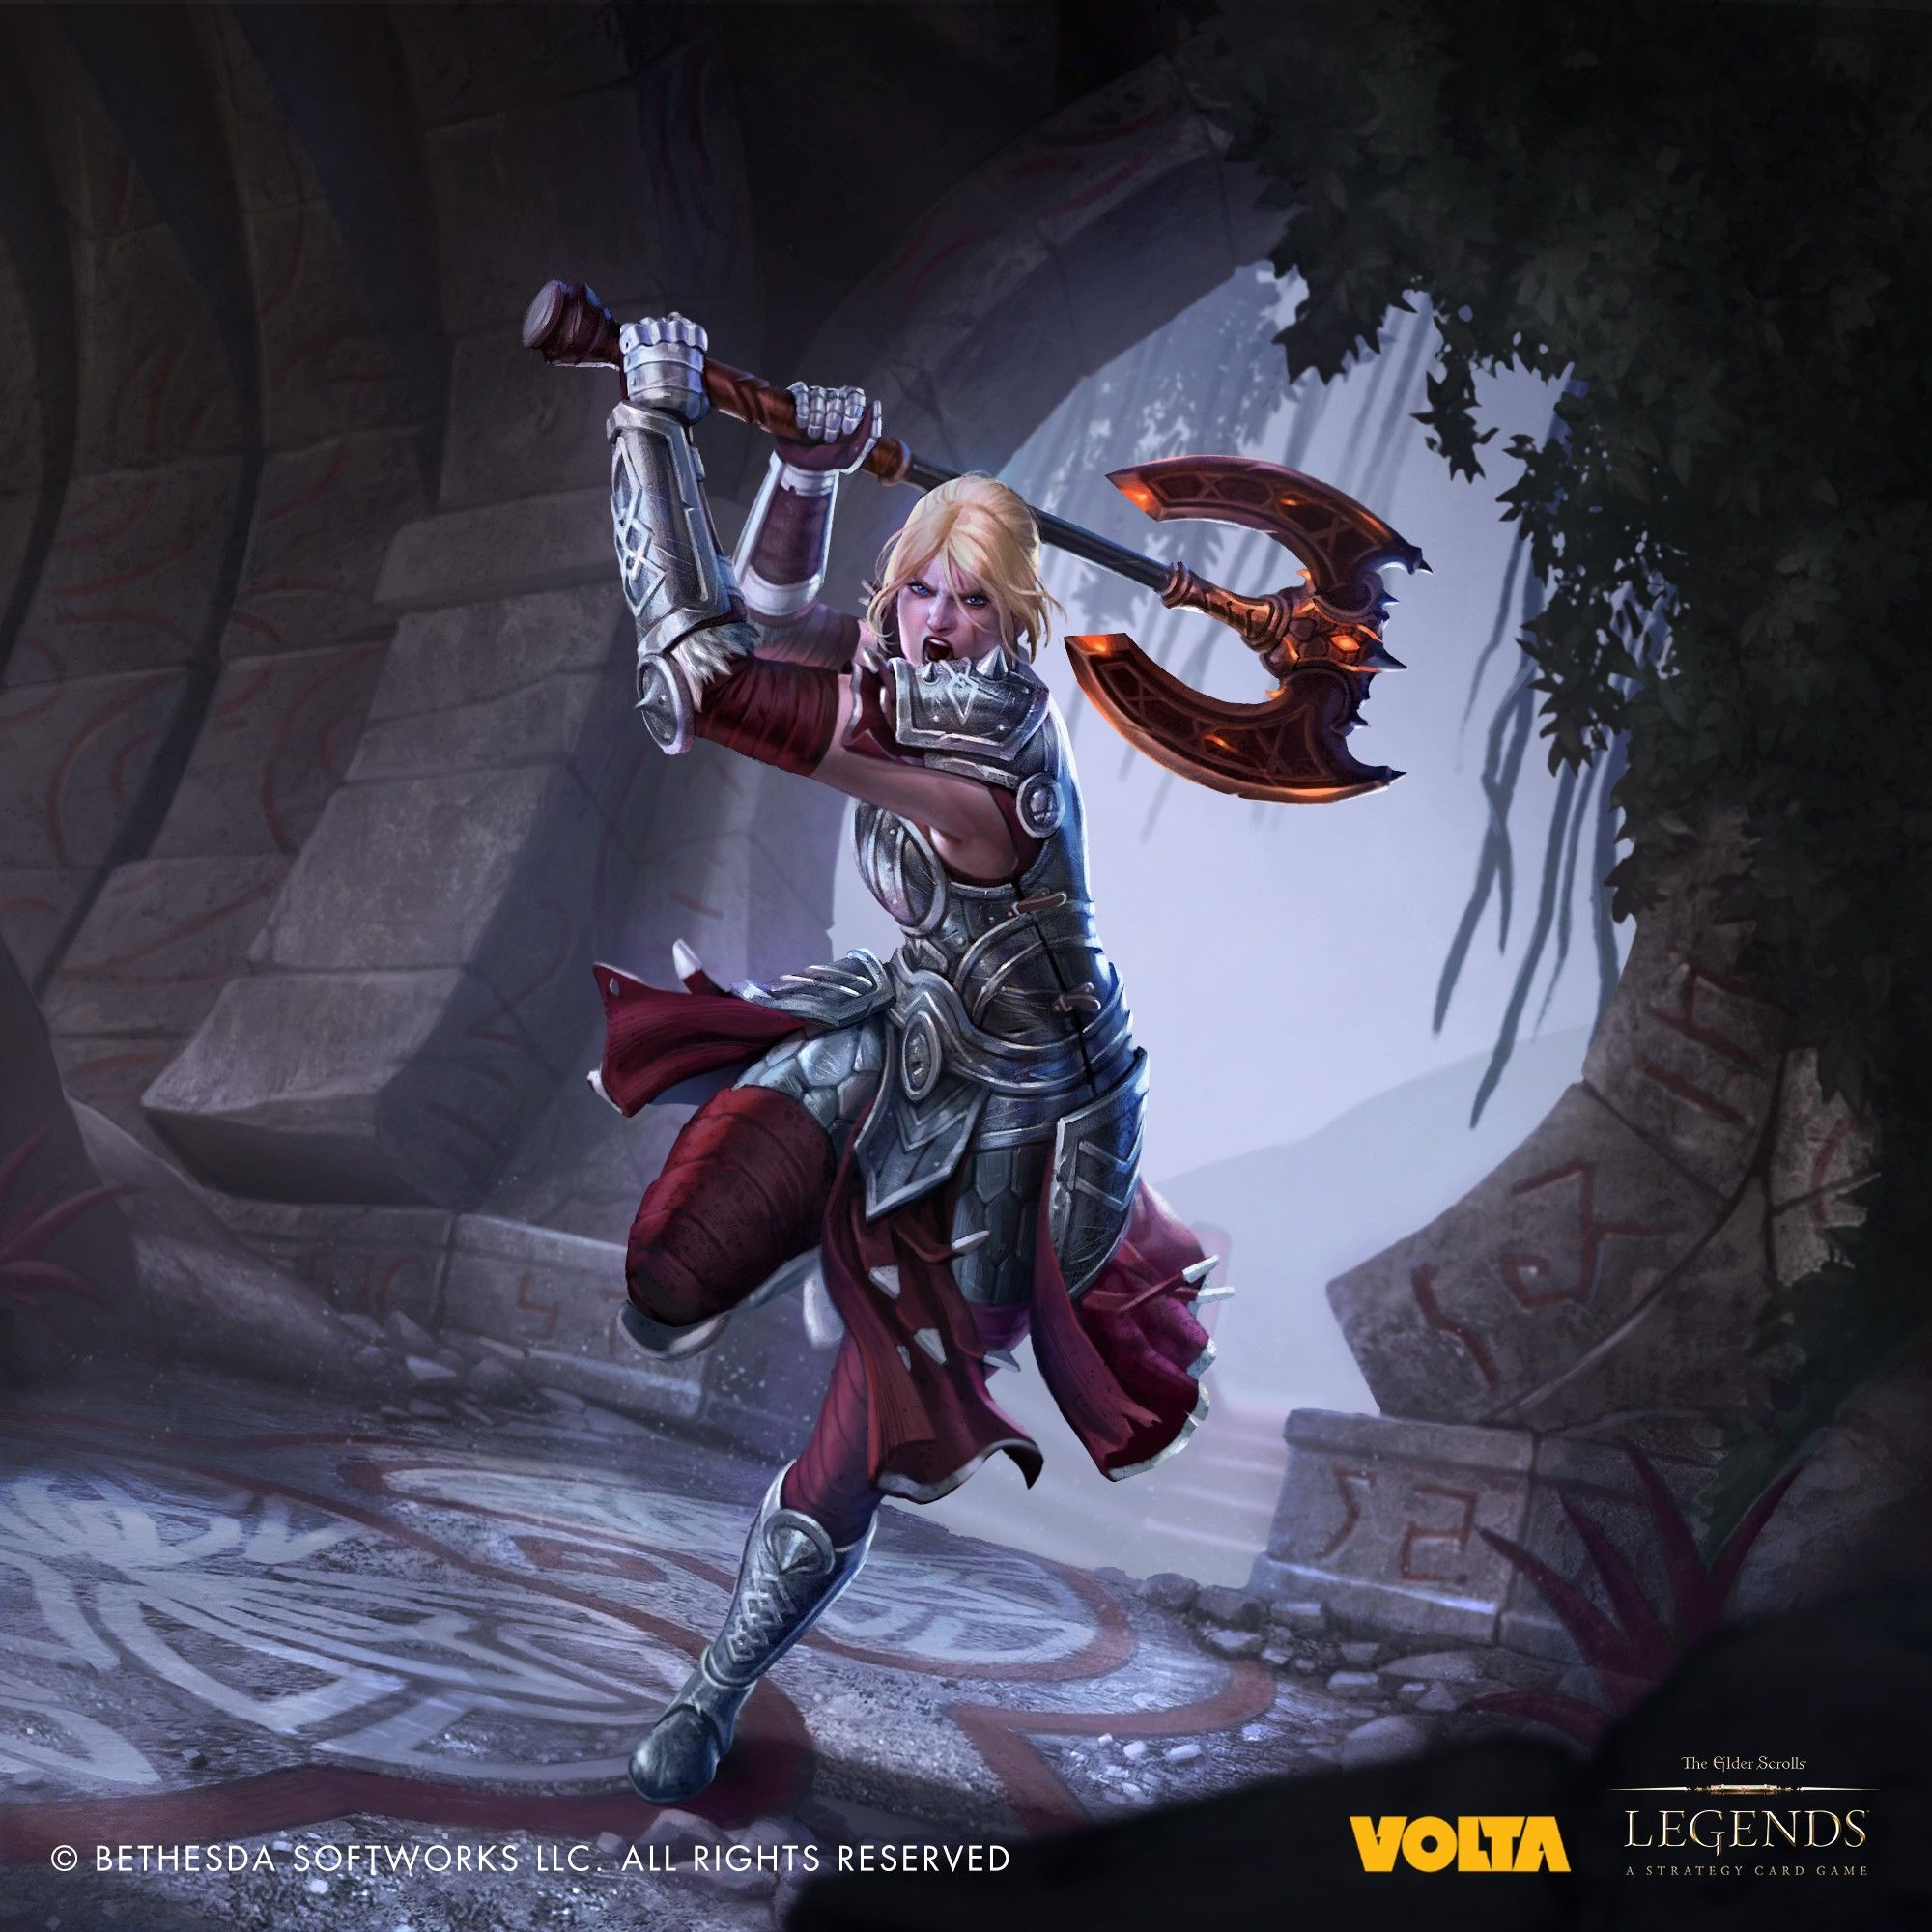 Pin On Characters Digital Art Imaginary Fantasy Worlds